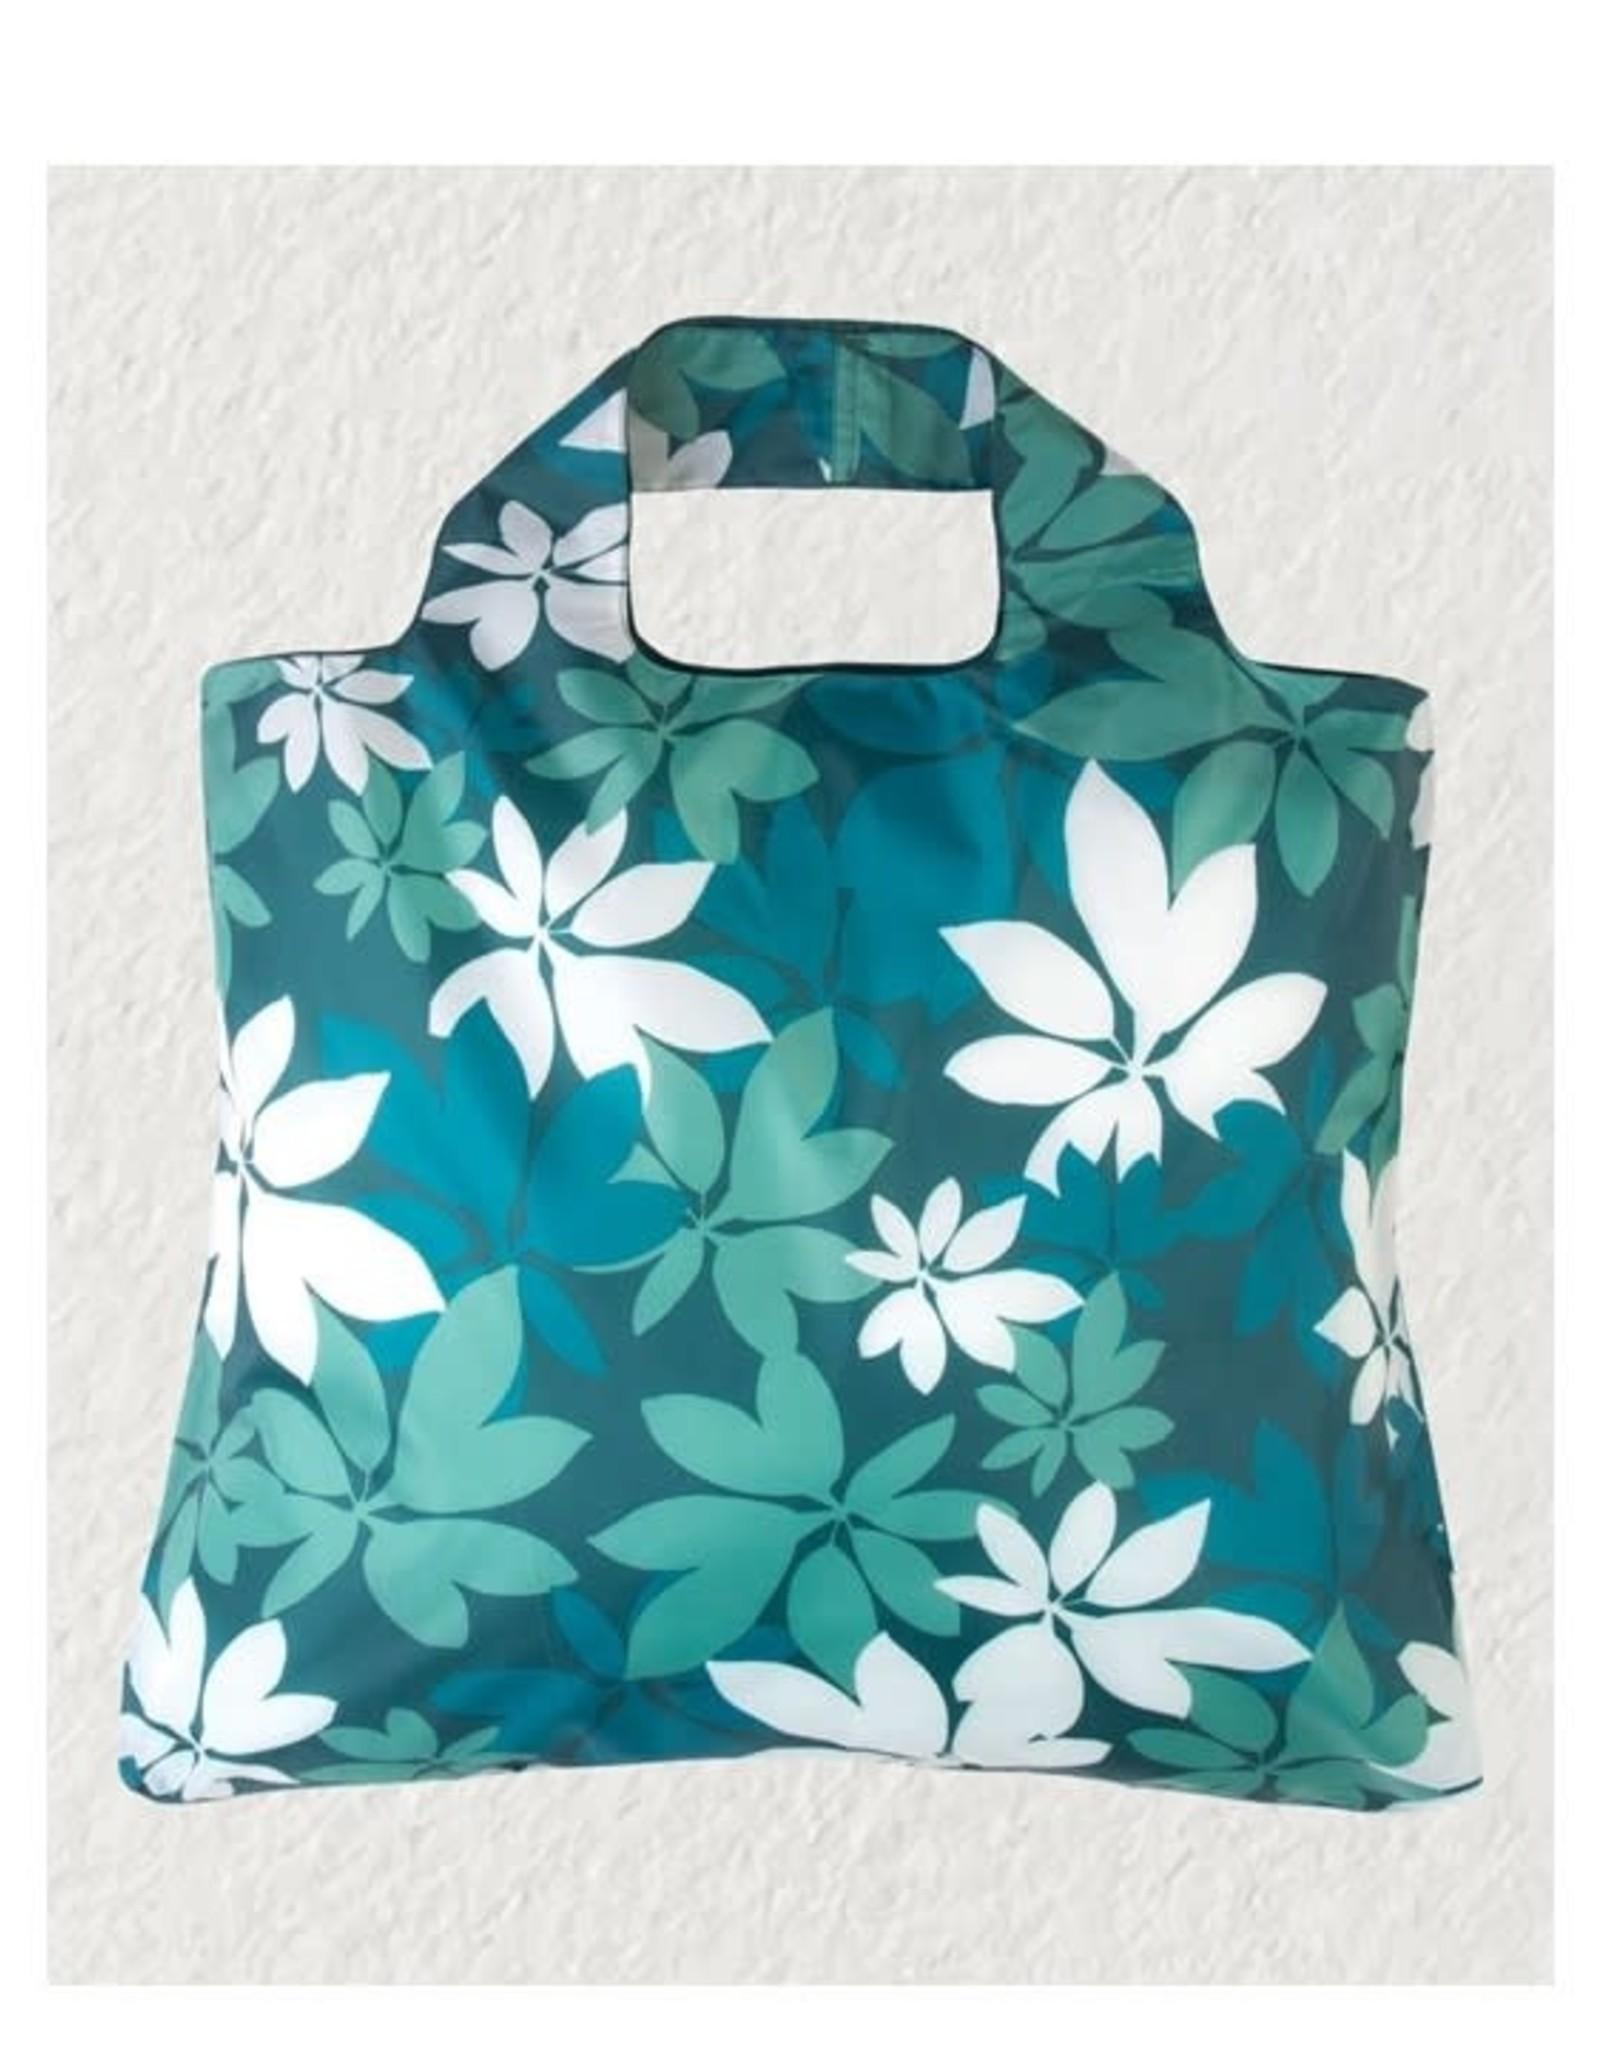 Envirosax Sac magasinage - Botanica